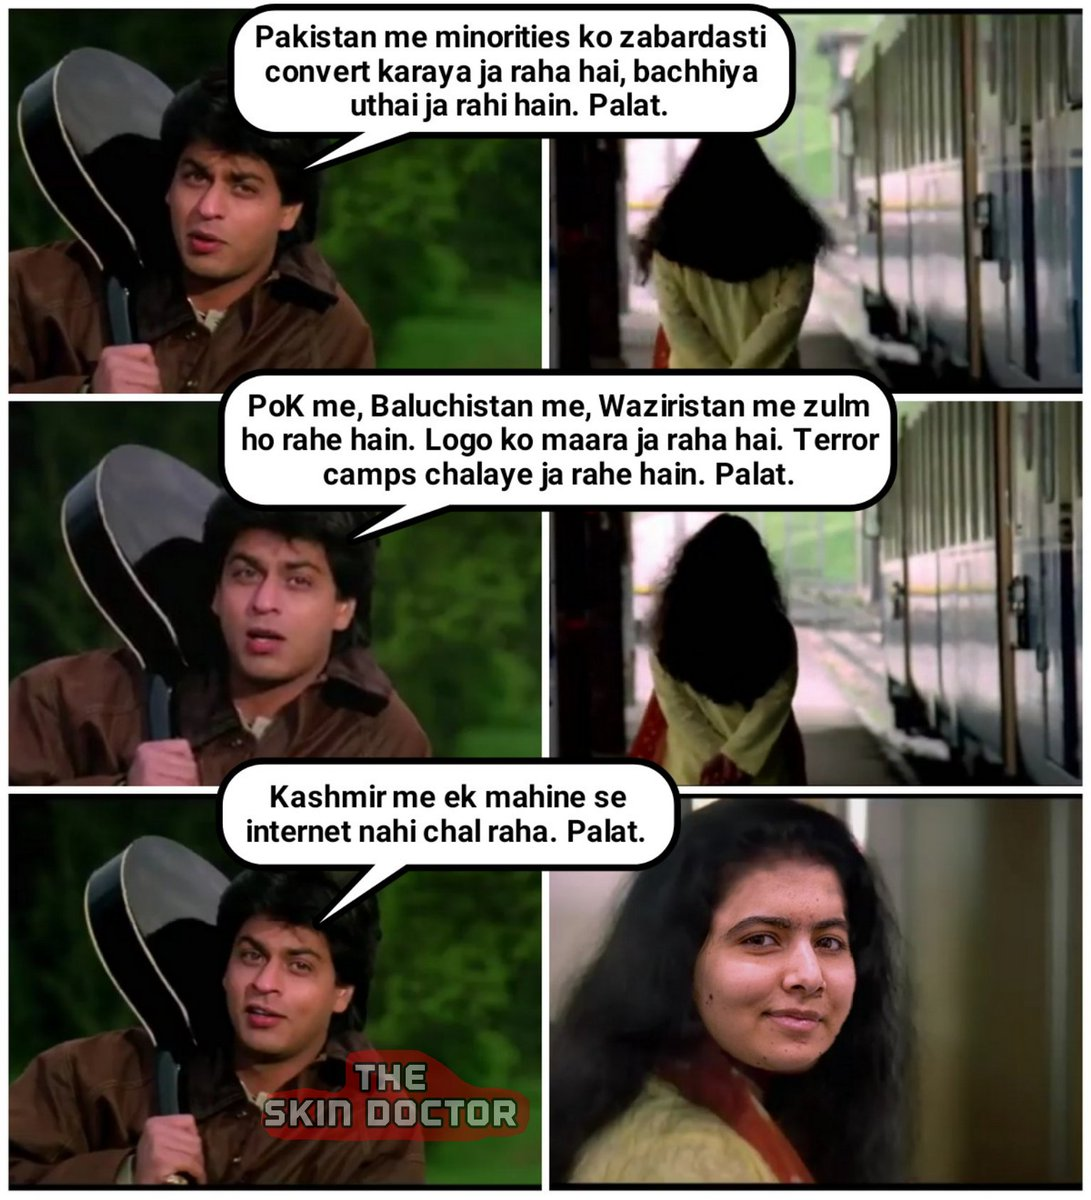 Miss @Malala's activism summarised :<br>http://pic.twitter.com/ehvjSygIBv